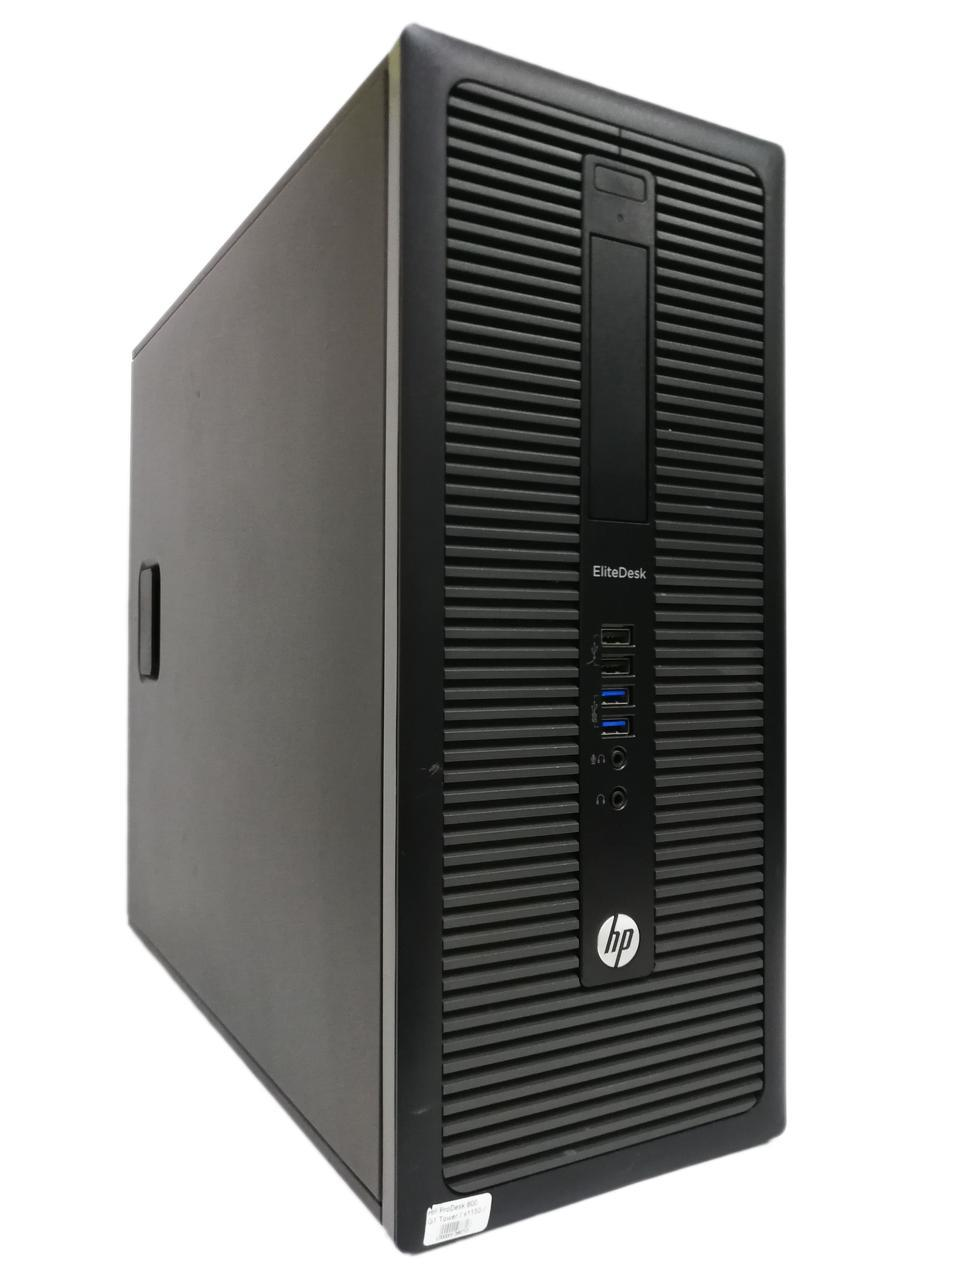 Компьютер HP EliteDesk 800 G1 Tower, Intel Core i5-4570, 8ГБ DDR3, SSD 240ГБ